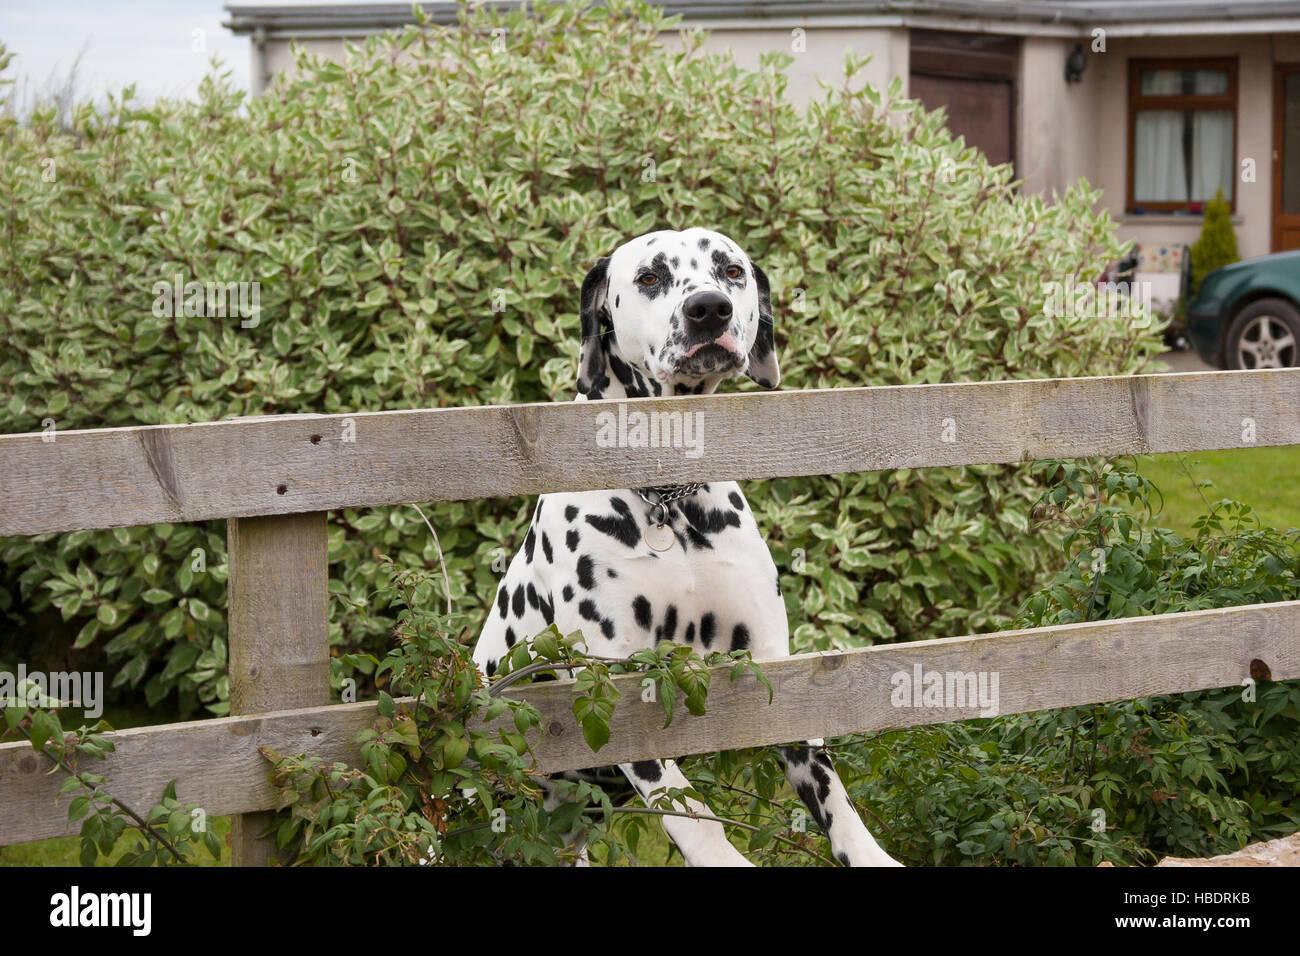 dalmatian dog alert at garden fence - Stock Image